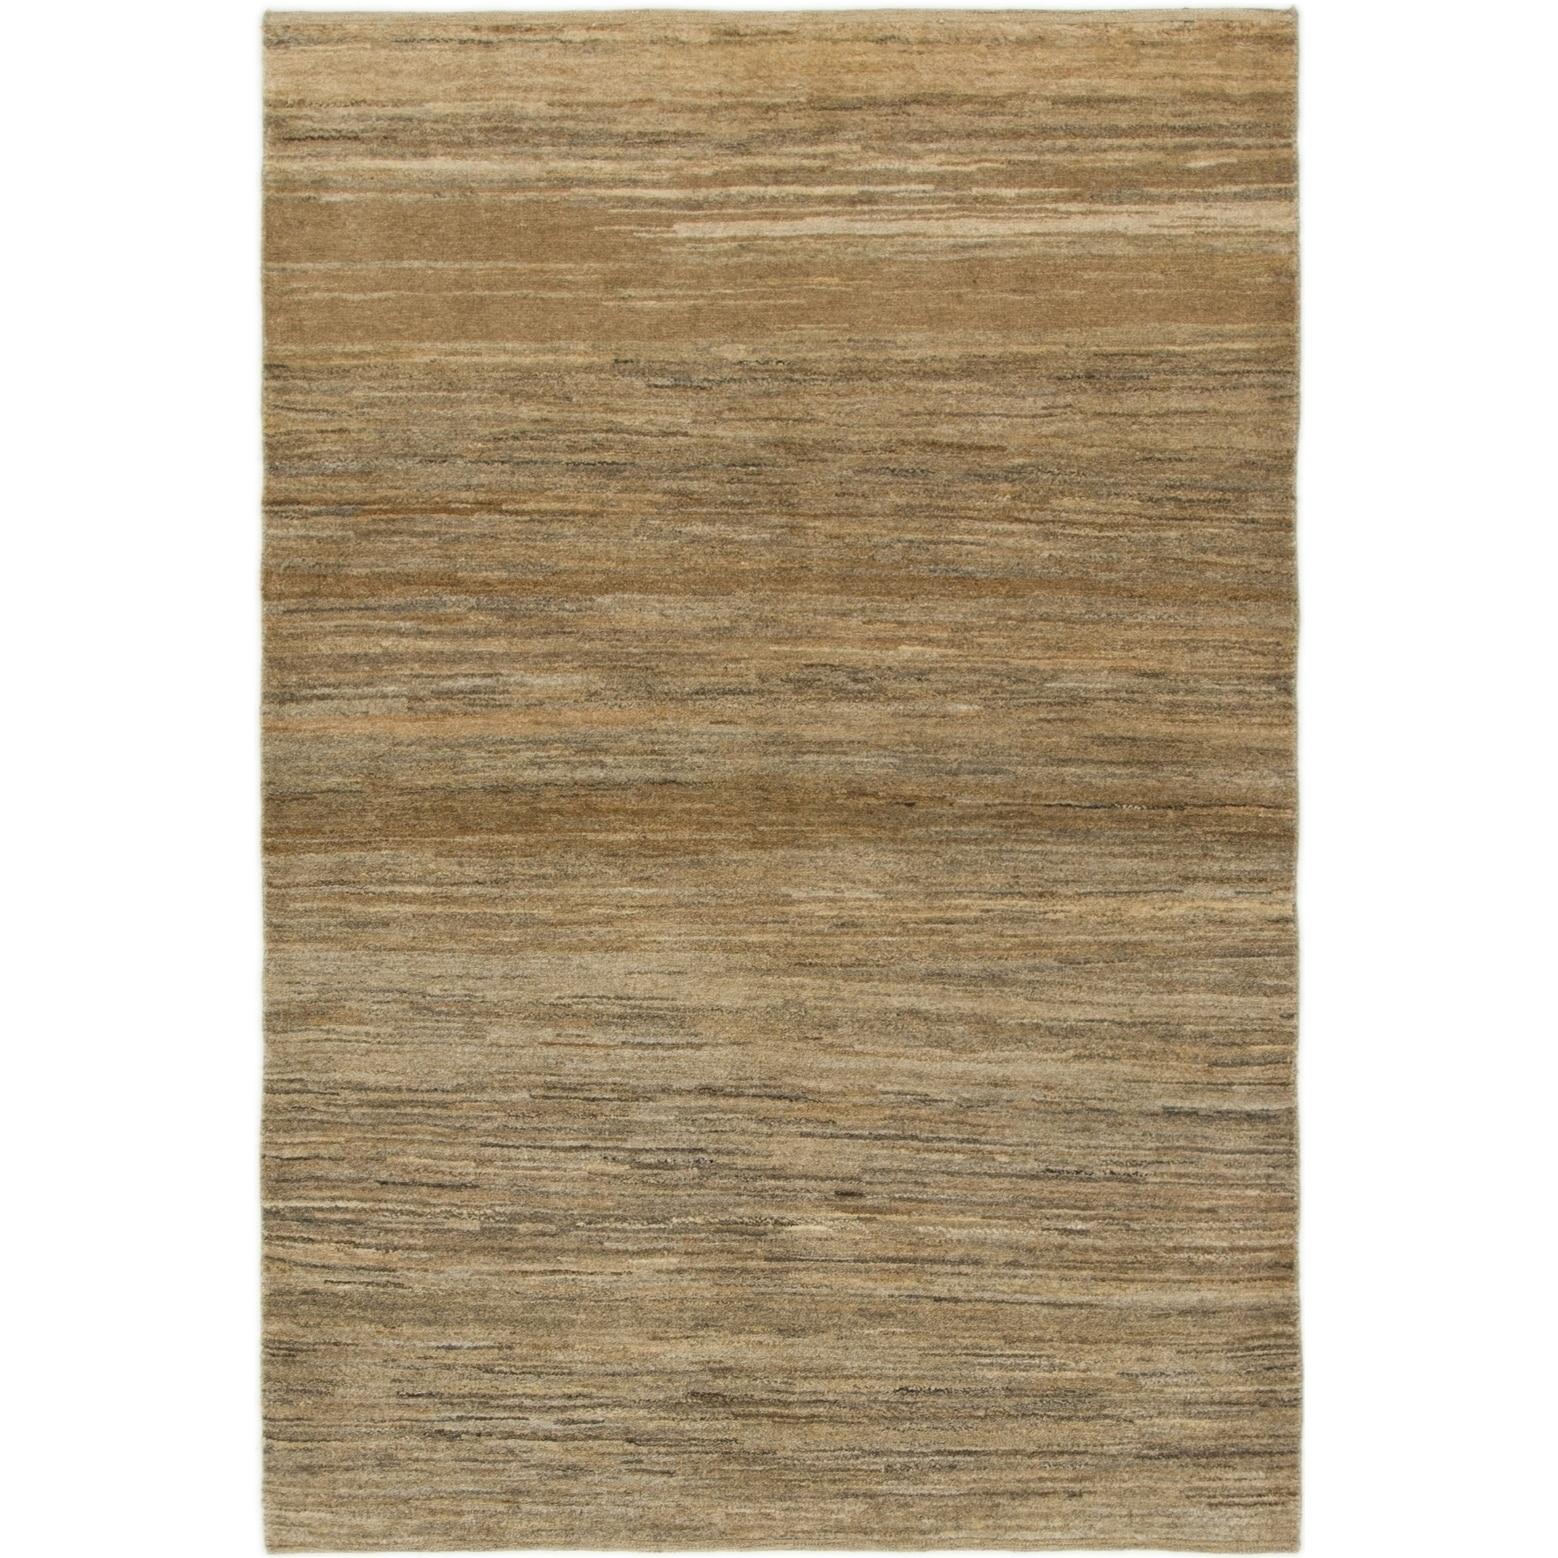 Hand Knotted Kashkuli Gabbeh Wool Area Rug - 4 x 5 10 (Brown - 4 x 5 10)